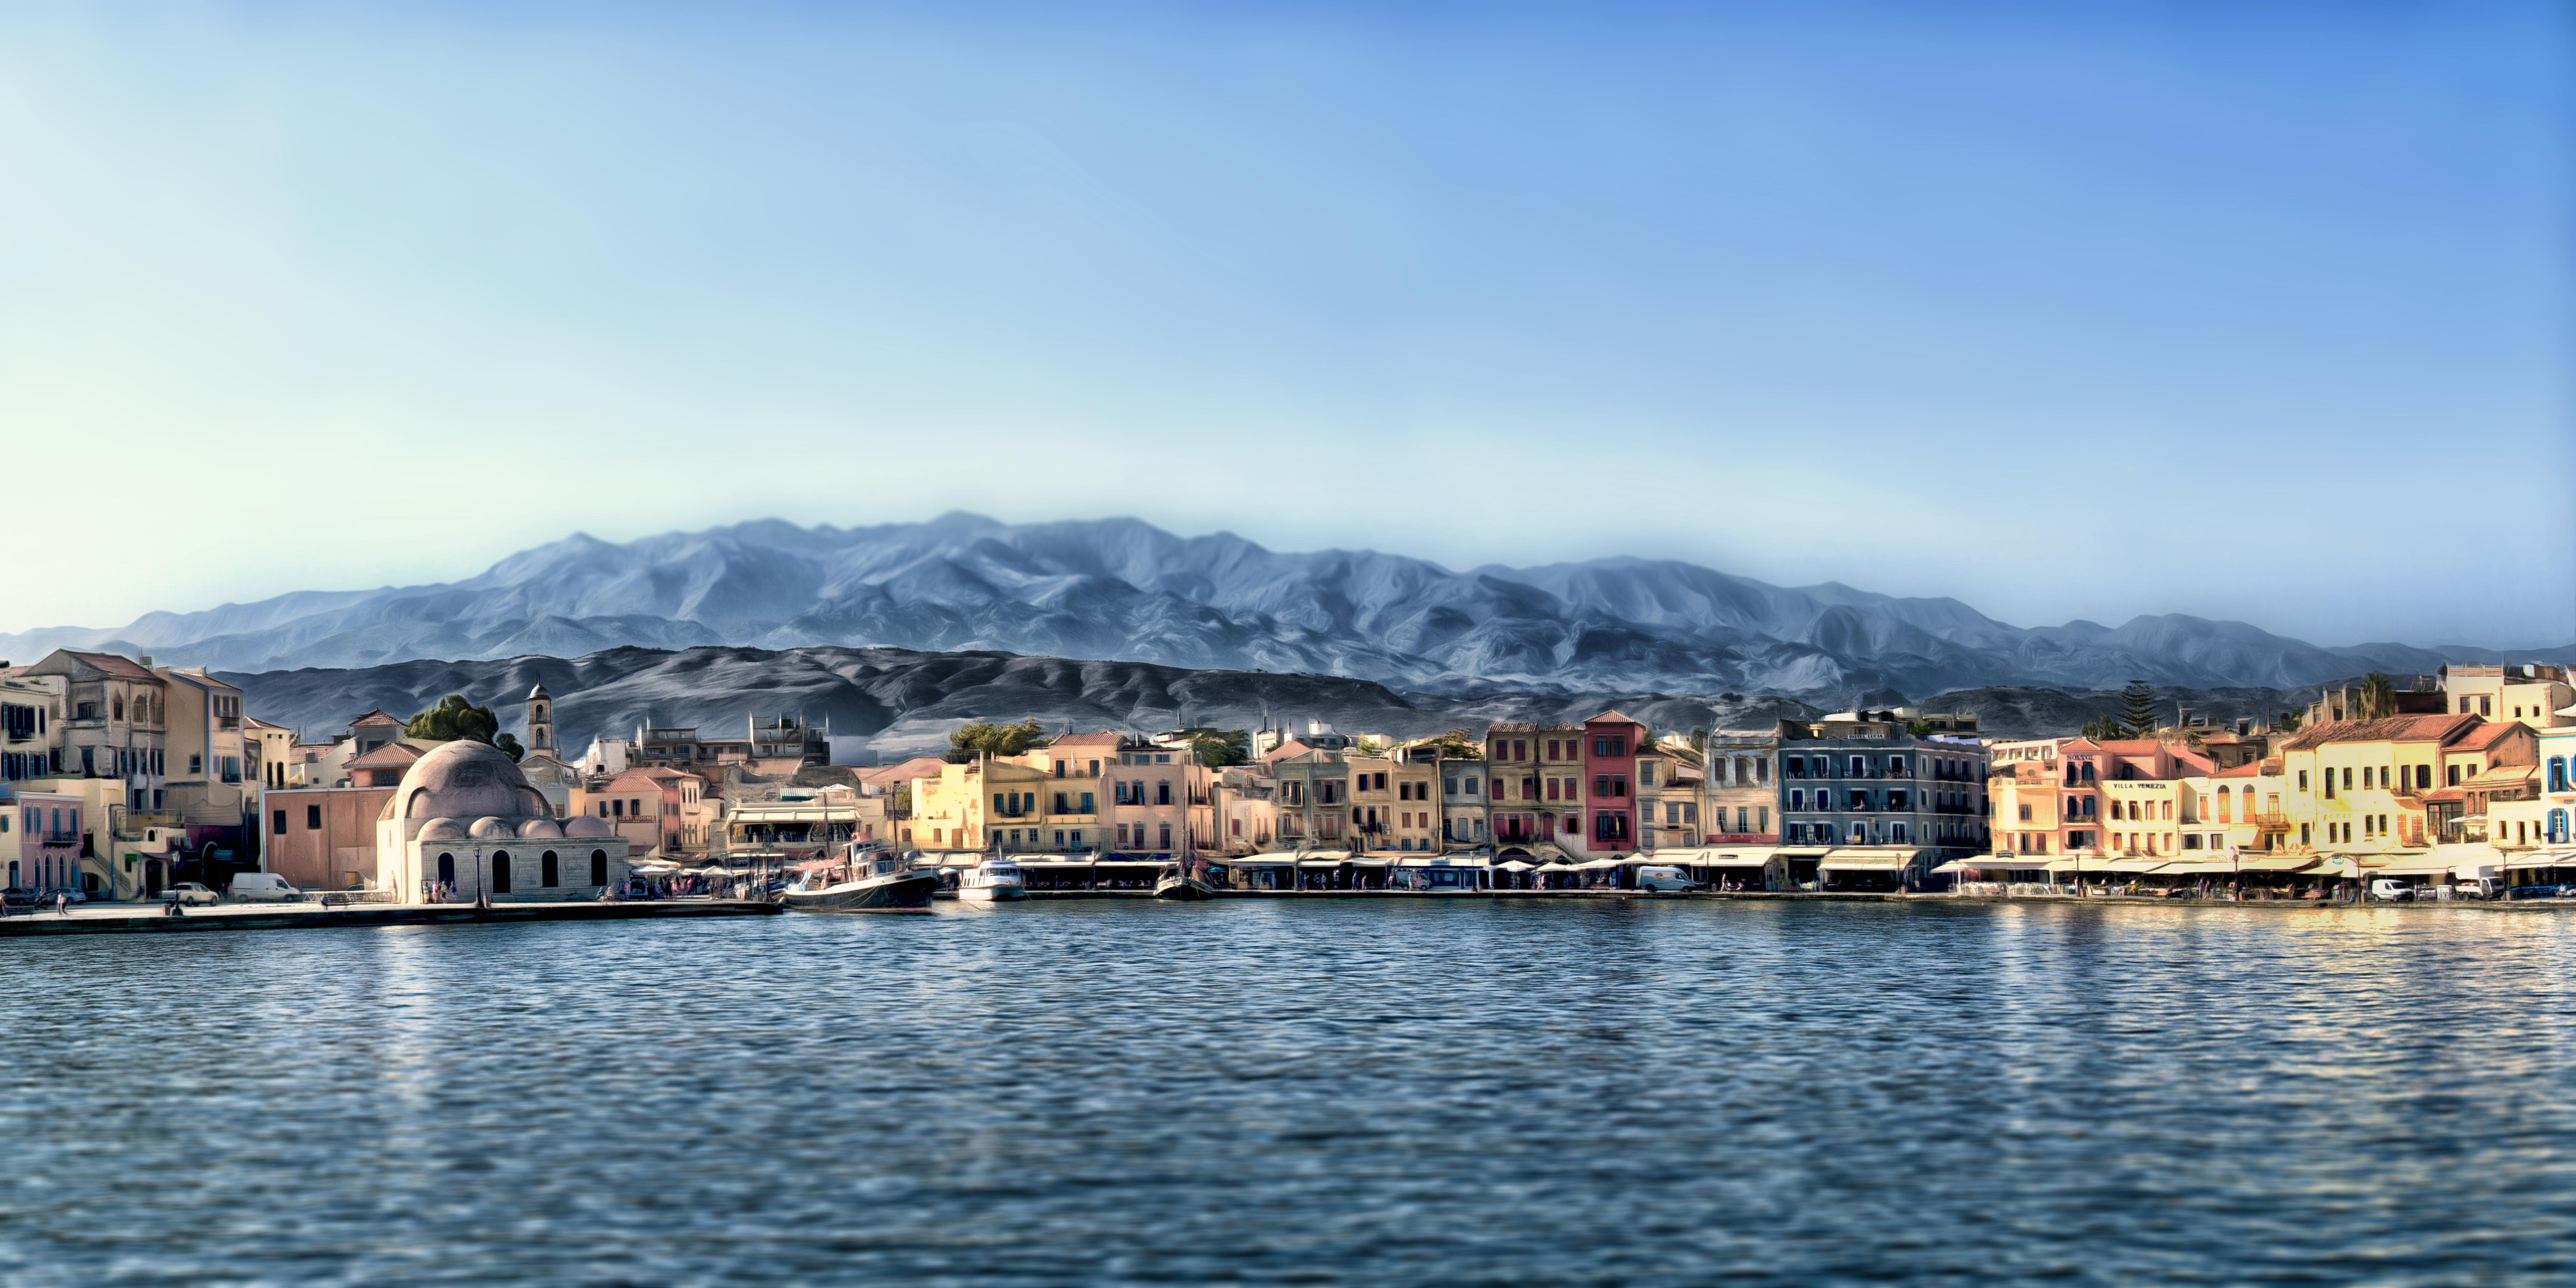 Chania Hafen, Kreta